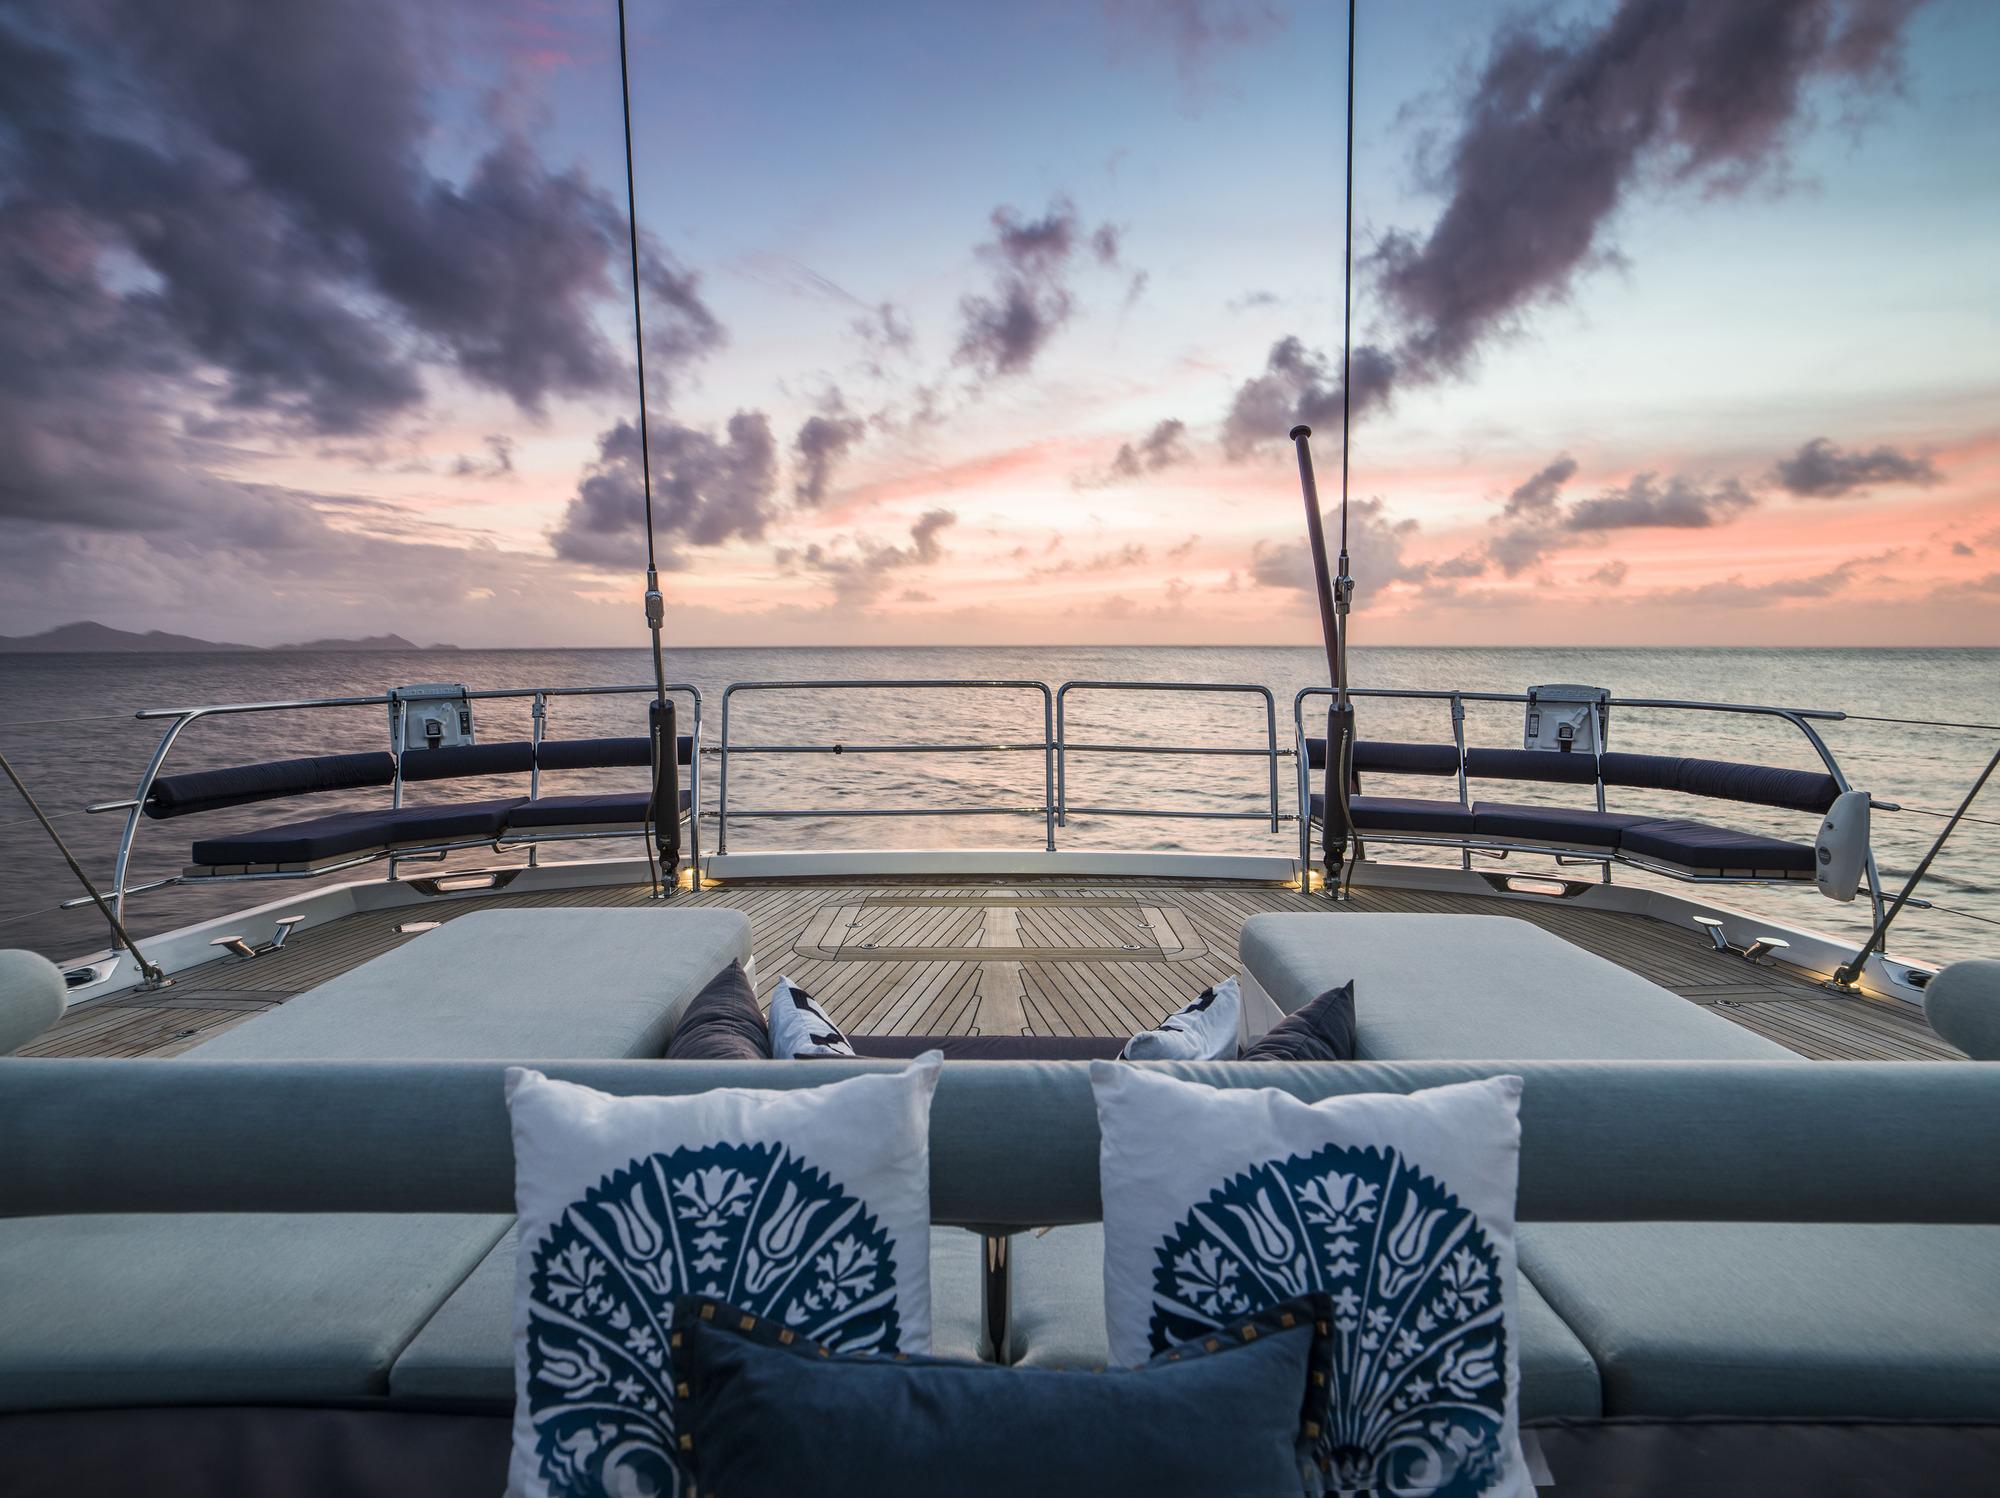 SY TWILIGHT - Aft deck by night